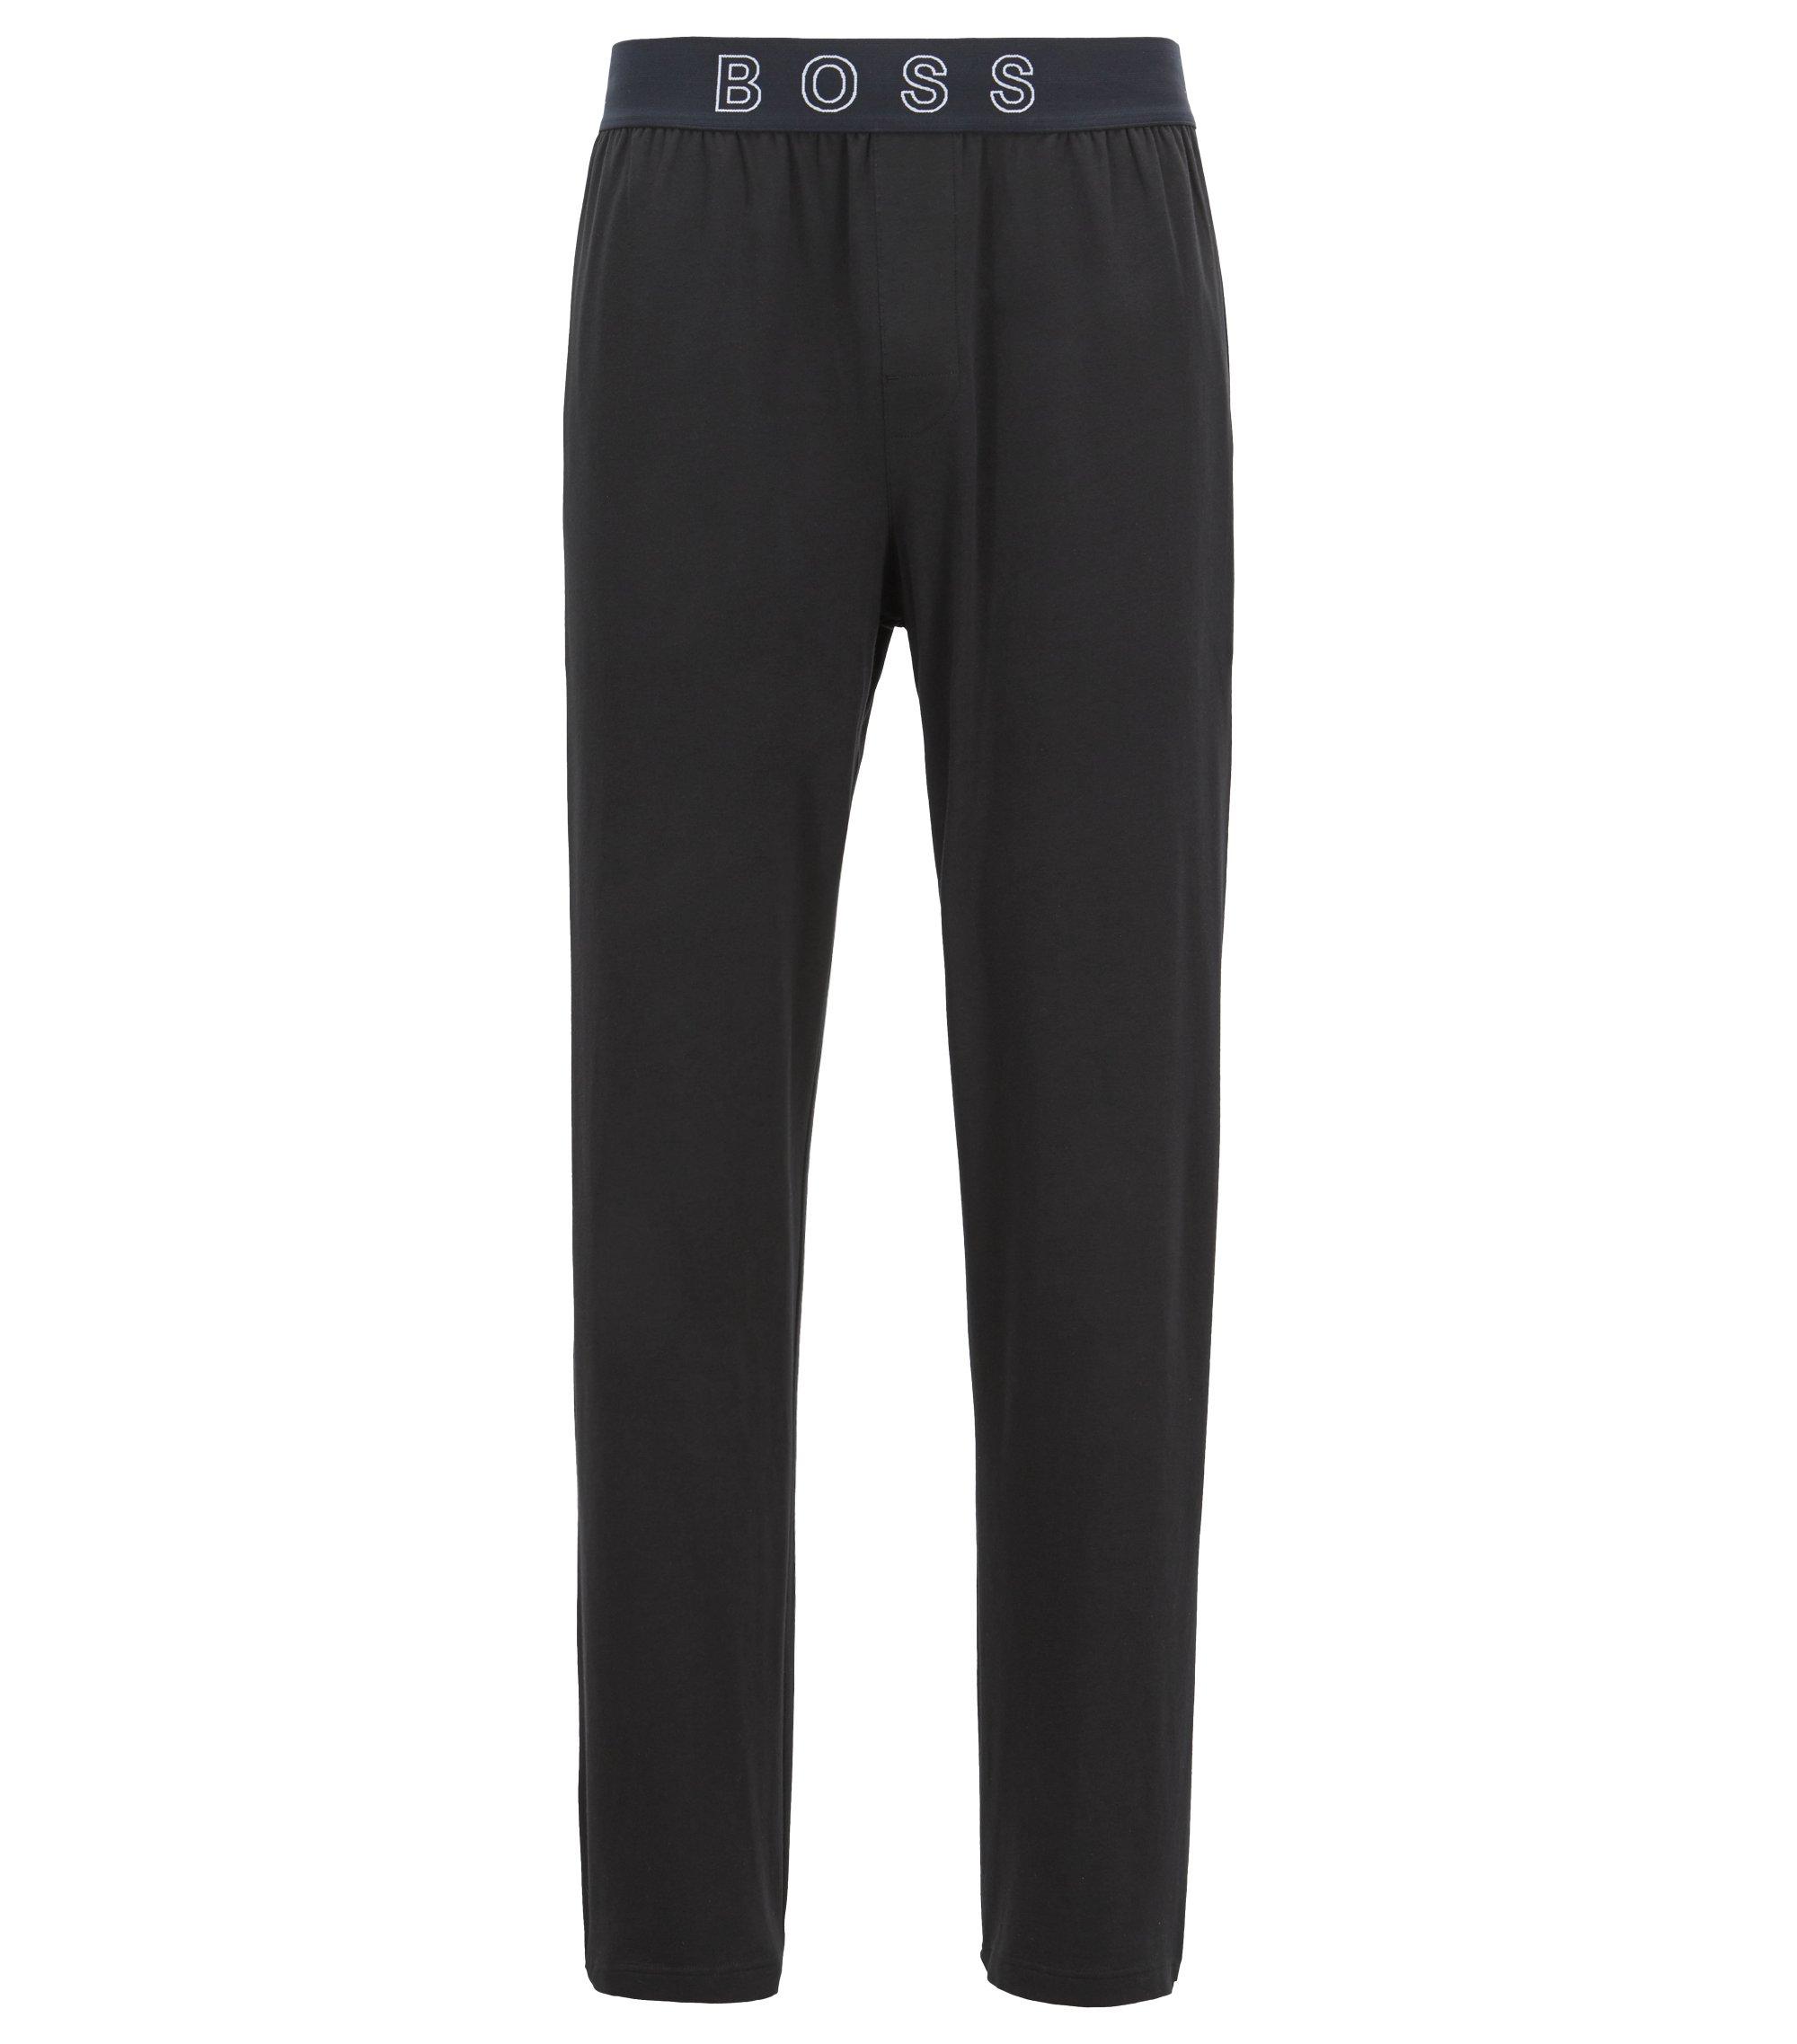 Pyjama trousers in stretch cotton with logo waistband, Black